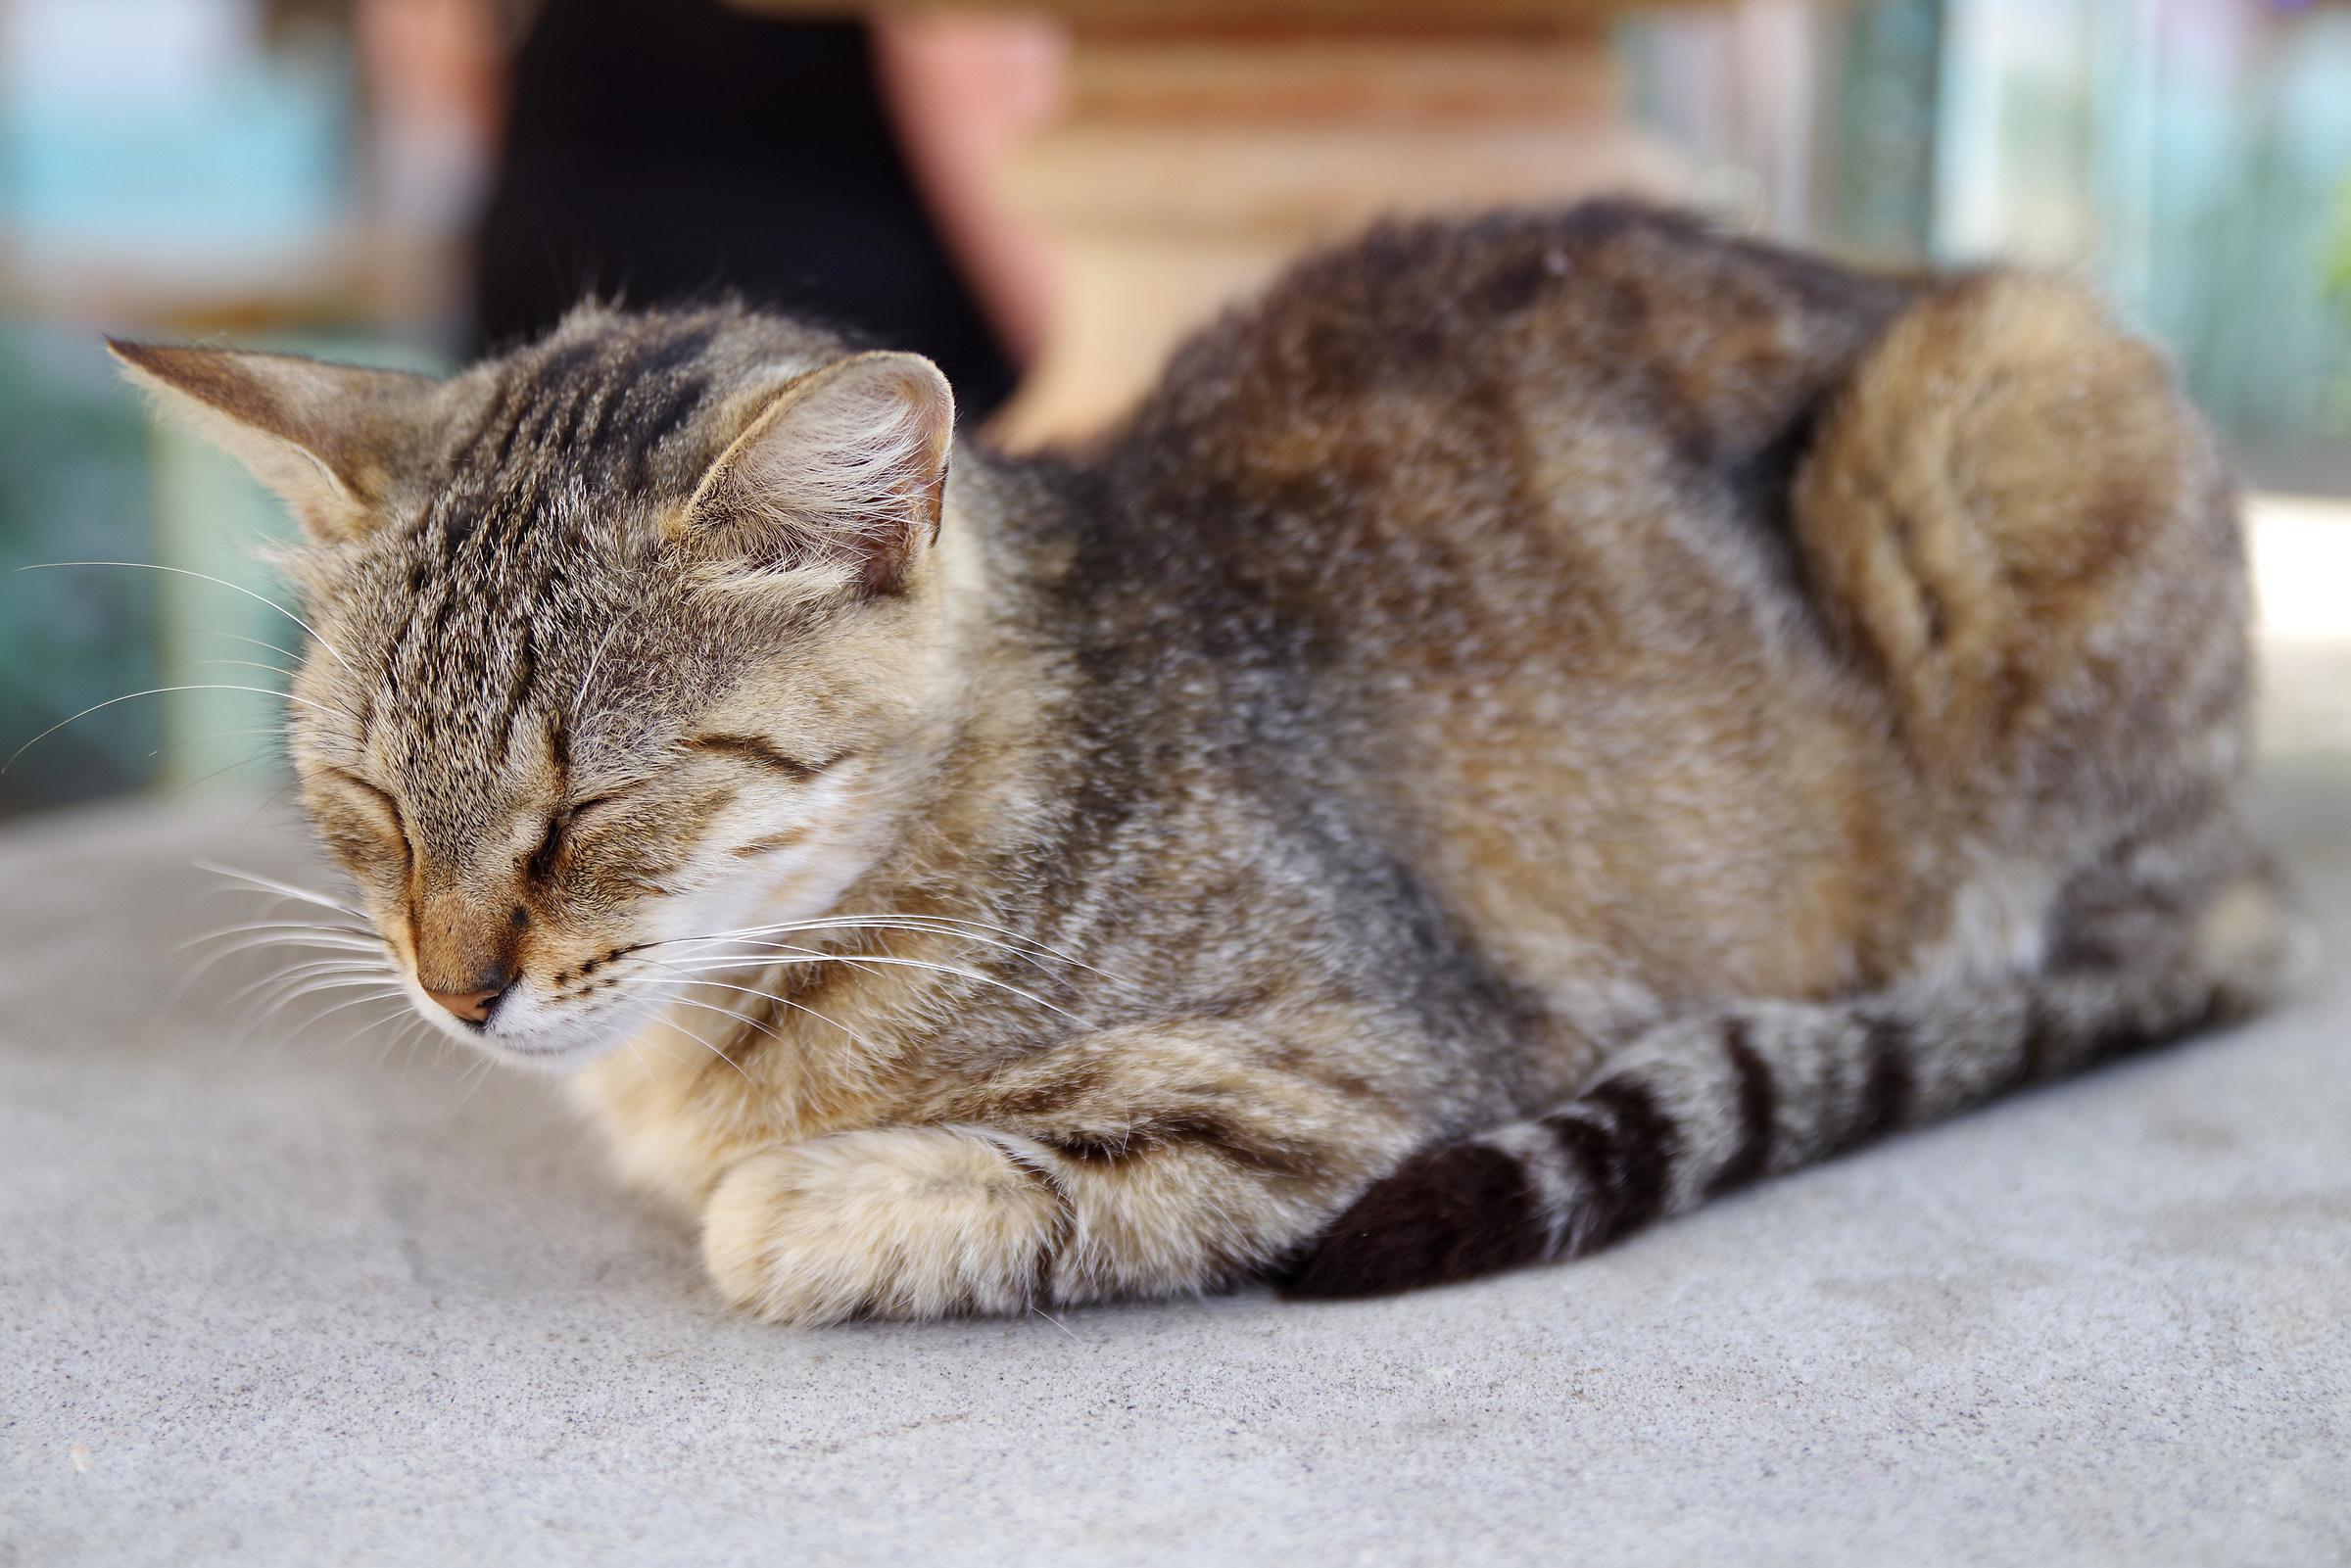 The siesta of the feline ...